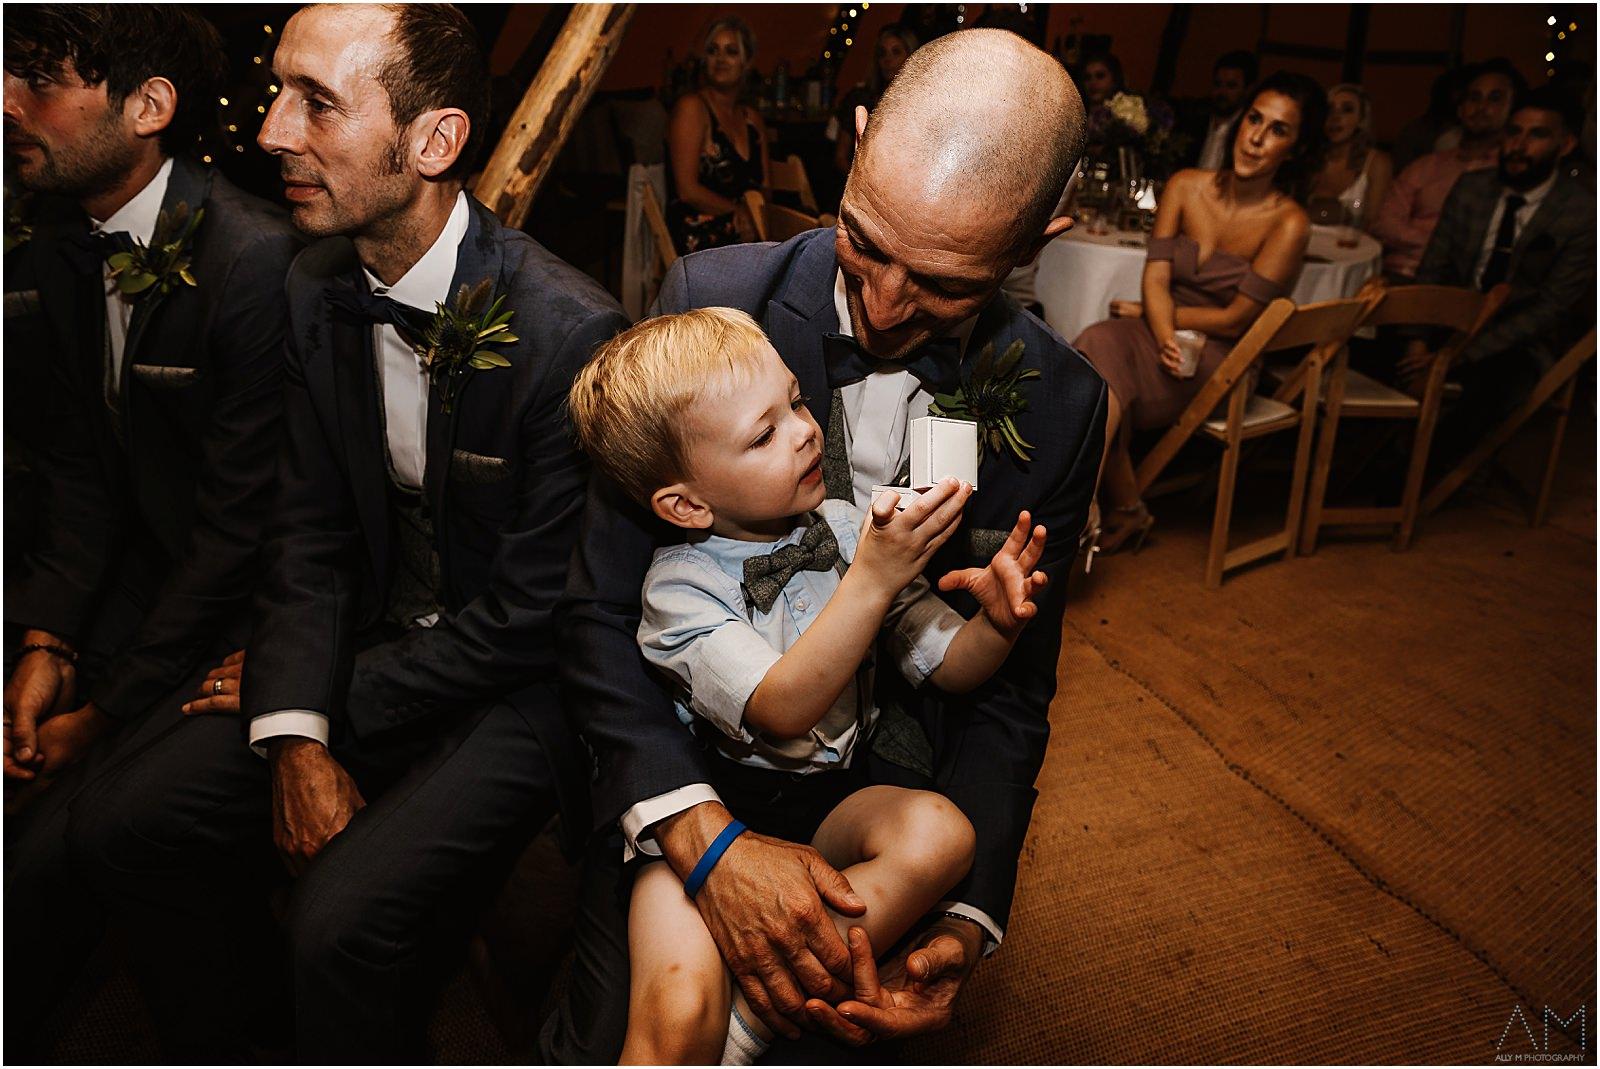 Little boy holding wedding rings